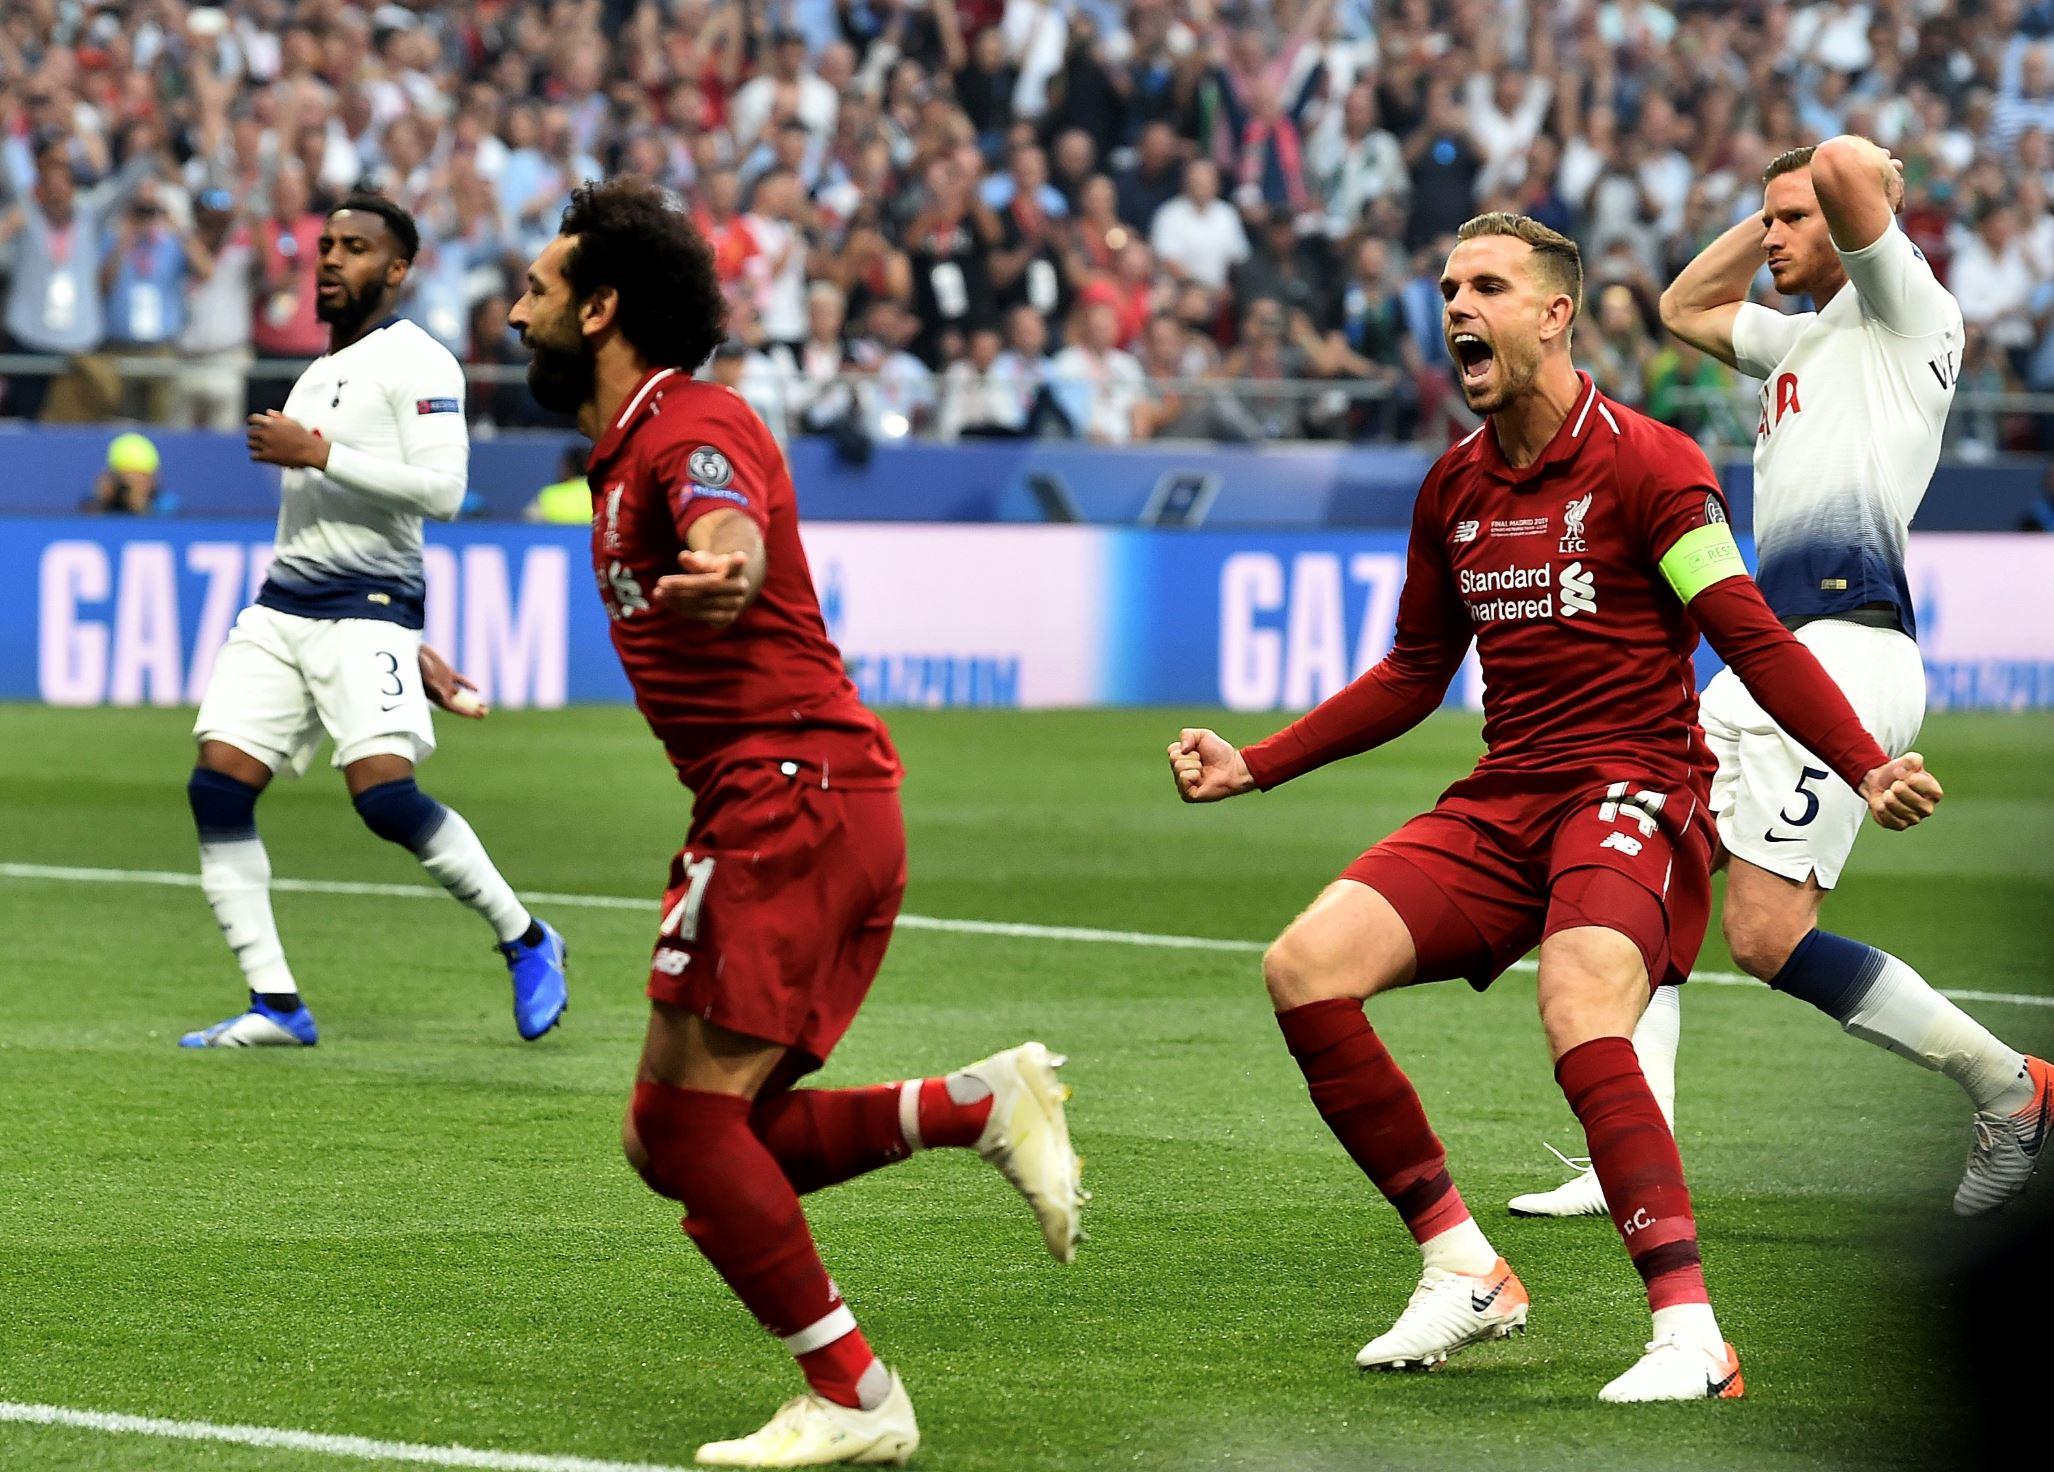 (video) liverpool juara champions league 2018/19